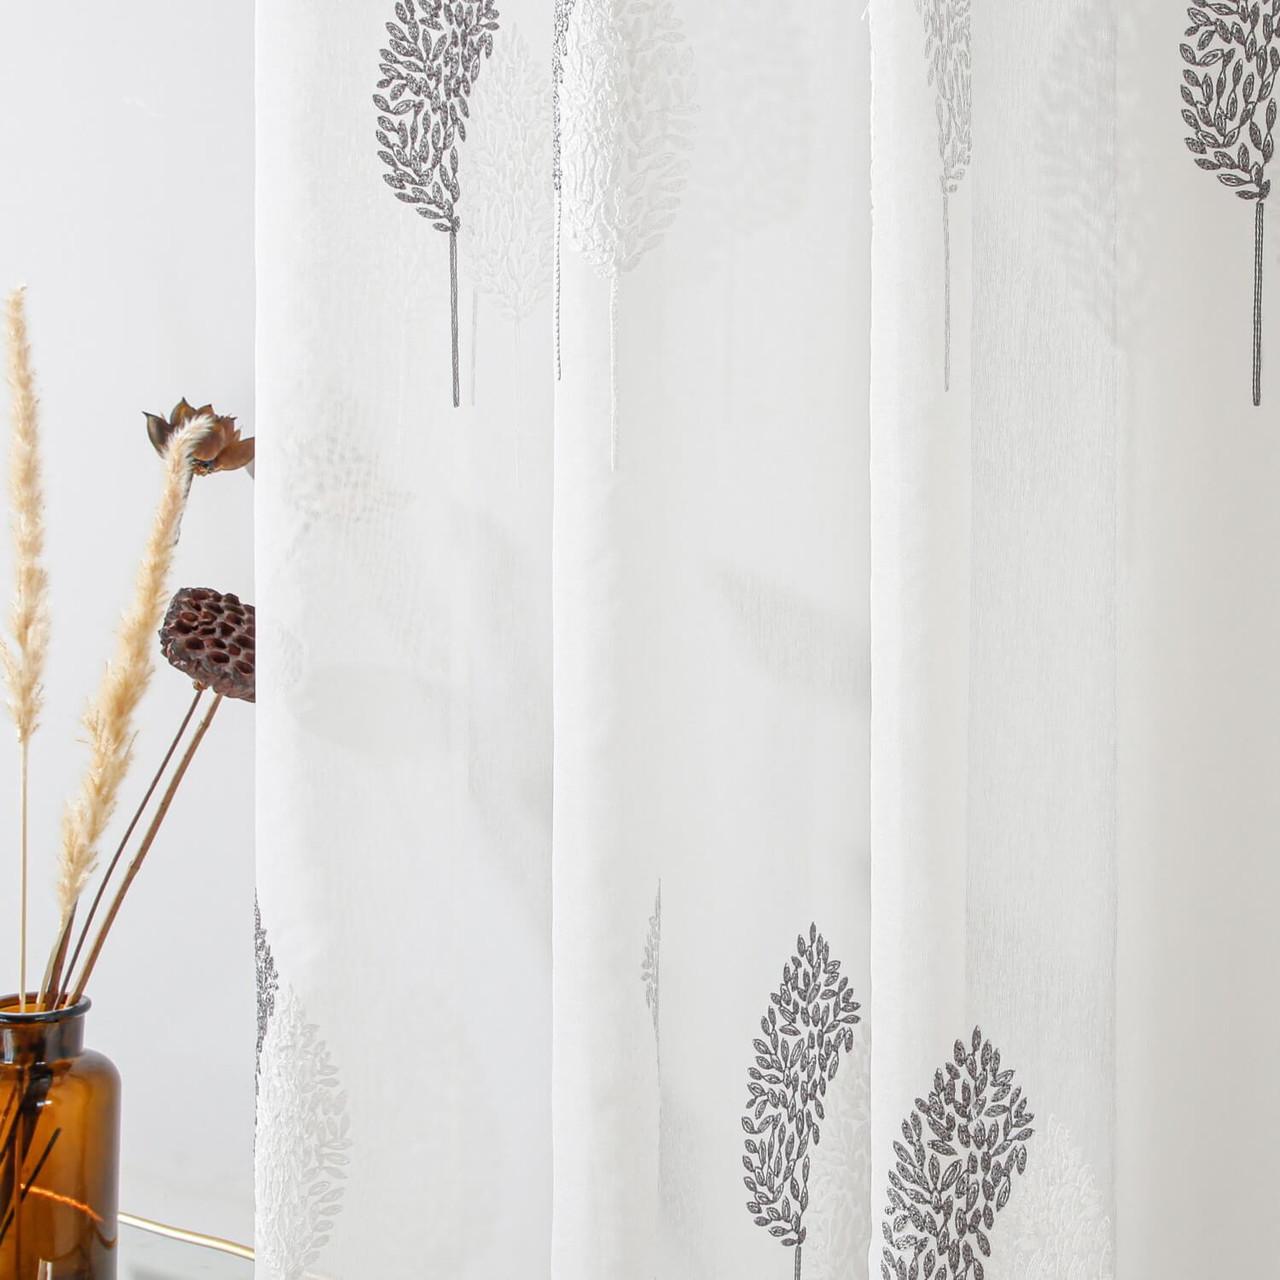 Dolce Mela Sheer Curtain Panel Grommet-Top Window Treatments DMC724  8171460151600